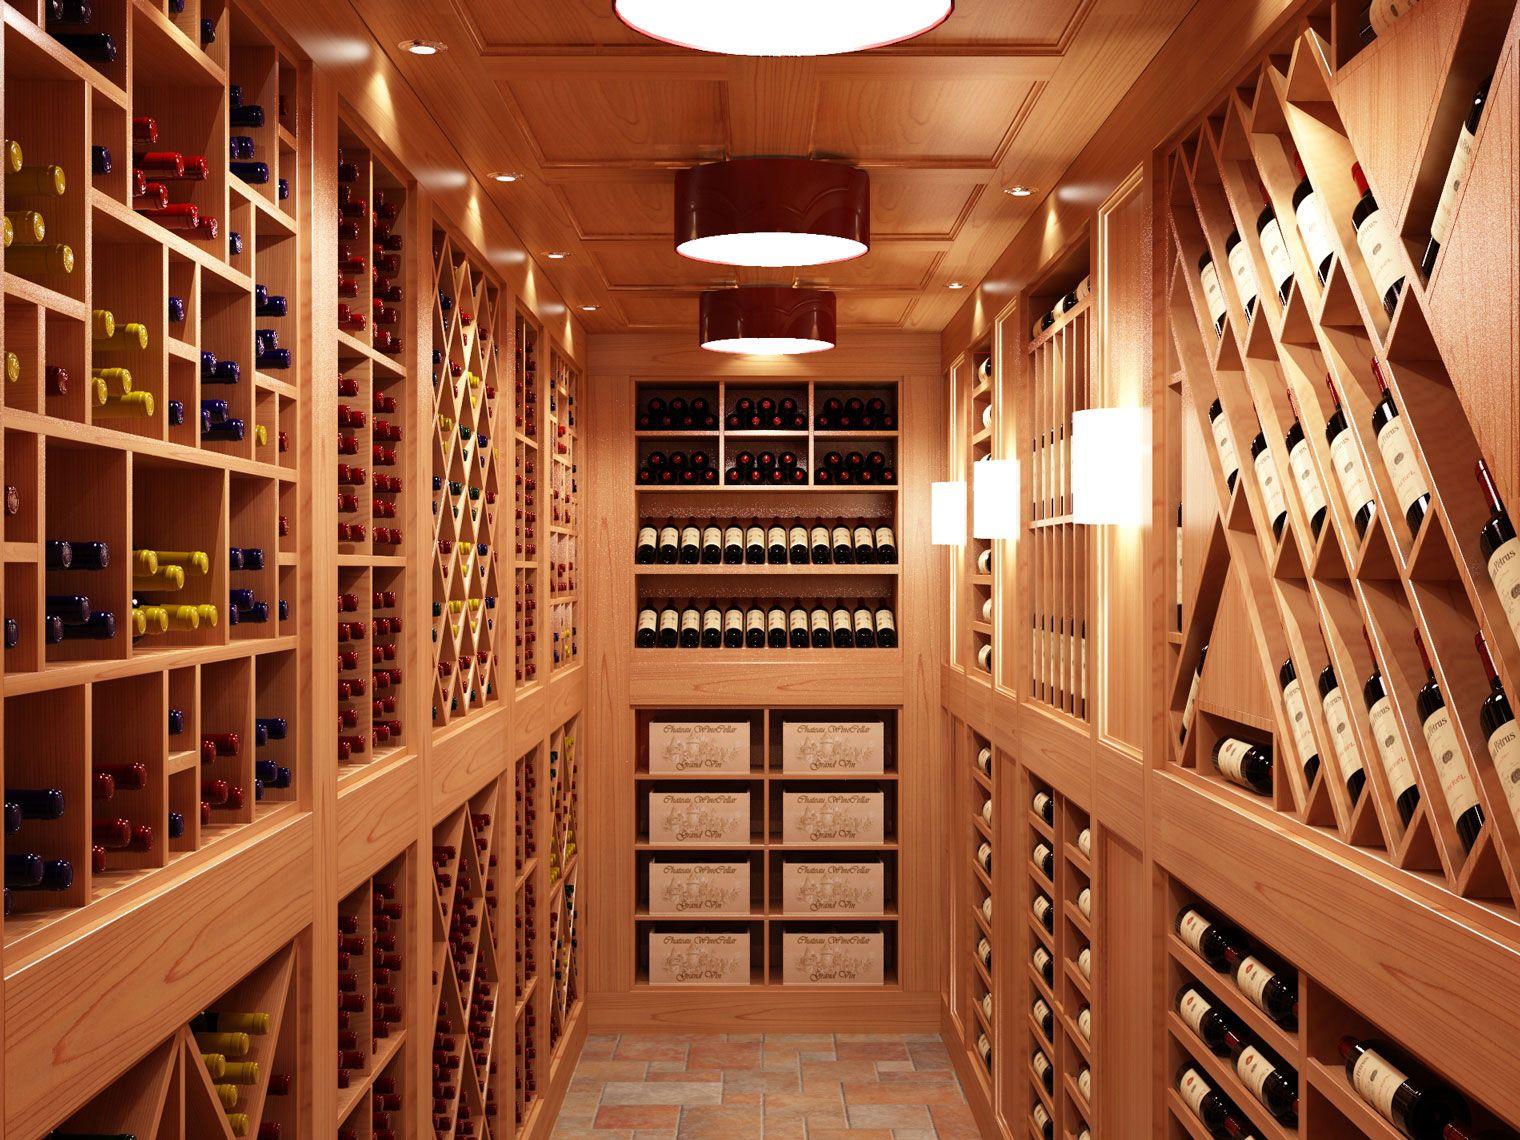 винного погреба, винном погребе, винный погреб, хранения вина